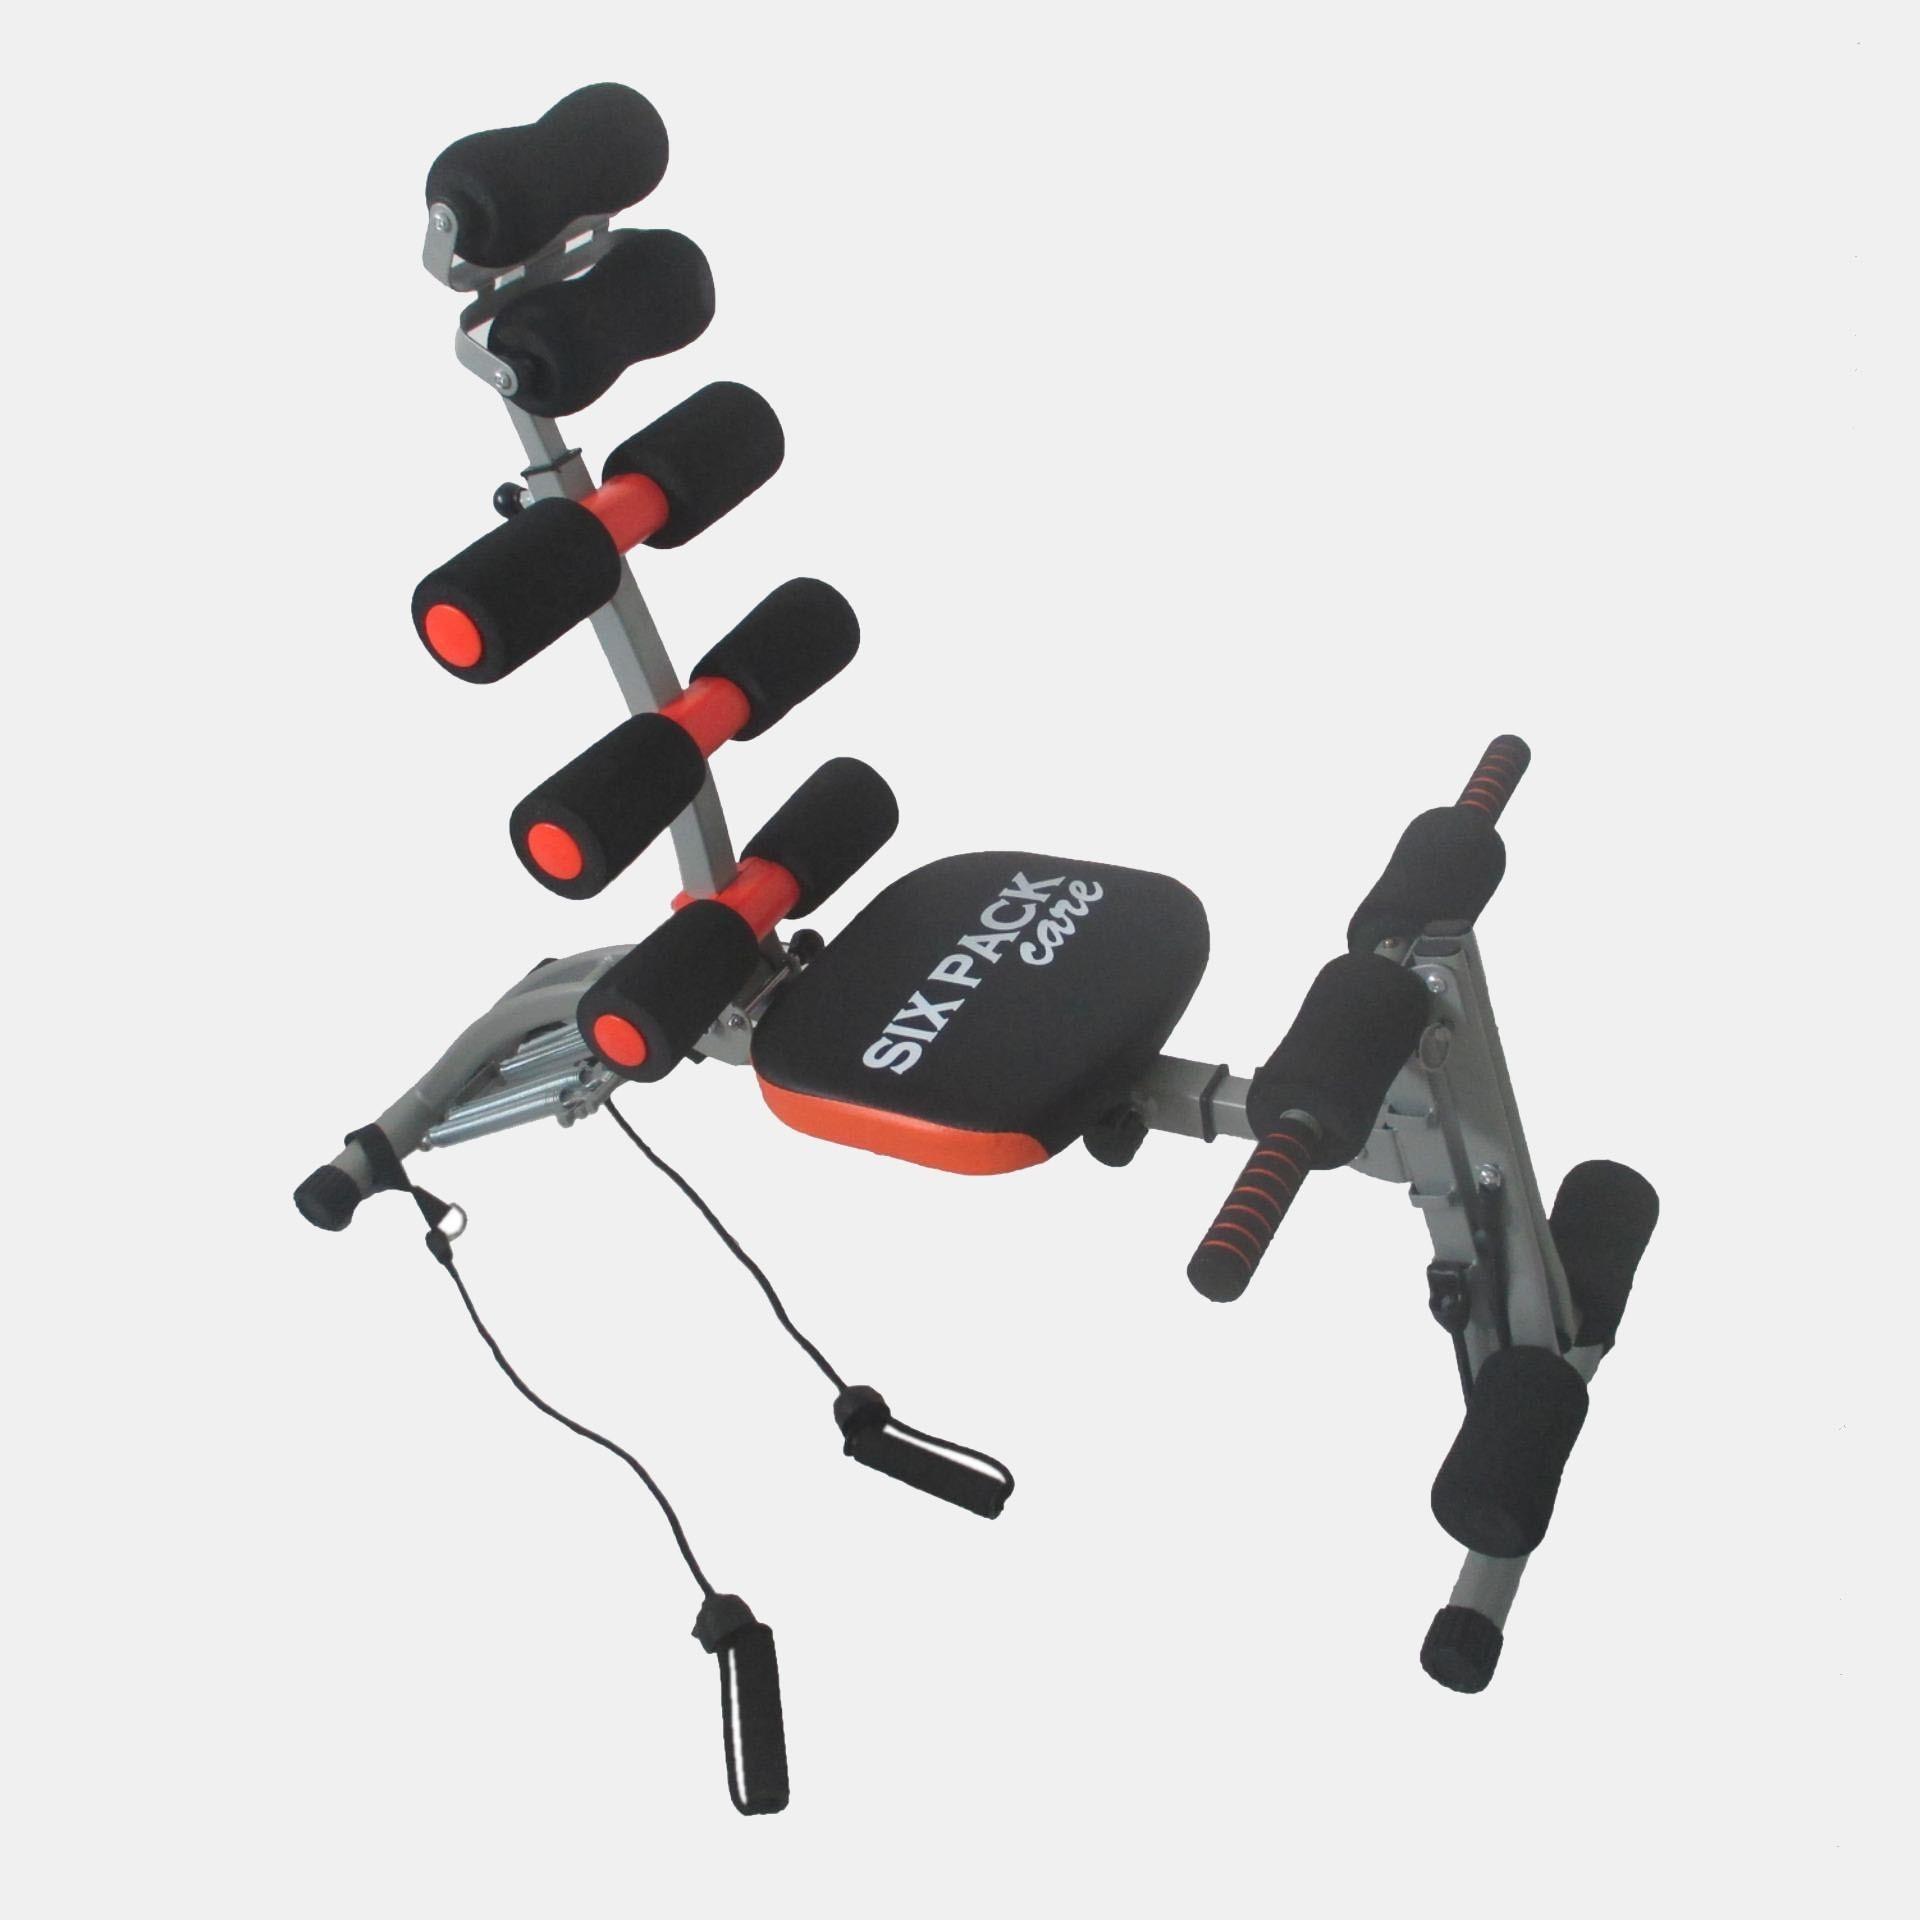 Total Fitness Sixpack  - Alat Olahraga - Alat Fitness - Alat Kesehatan - Body Building - Alat Sit Up (JABODETABEK Only)